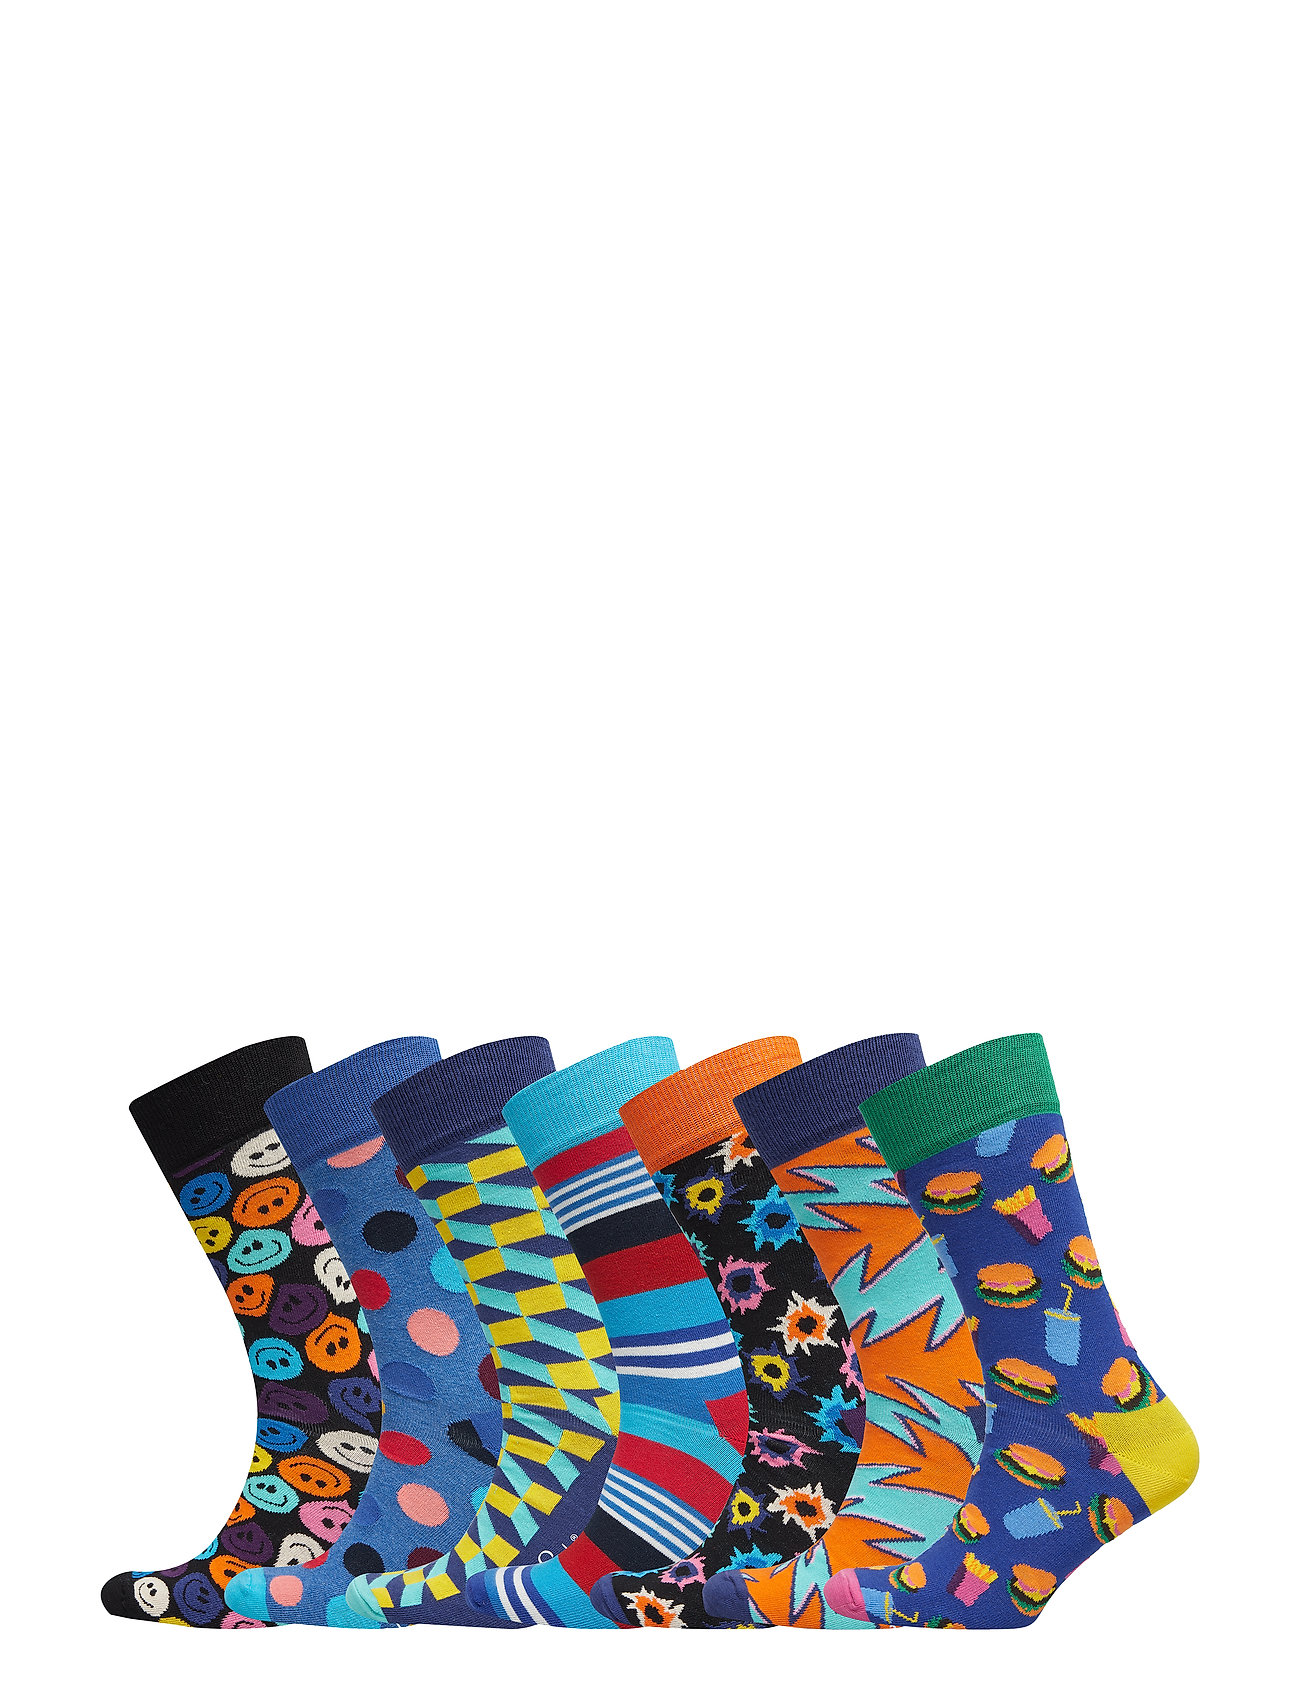 aa5fb340089c 7-day Gift Box (Multi) (£55.95) - Happy Socks -